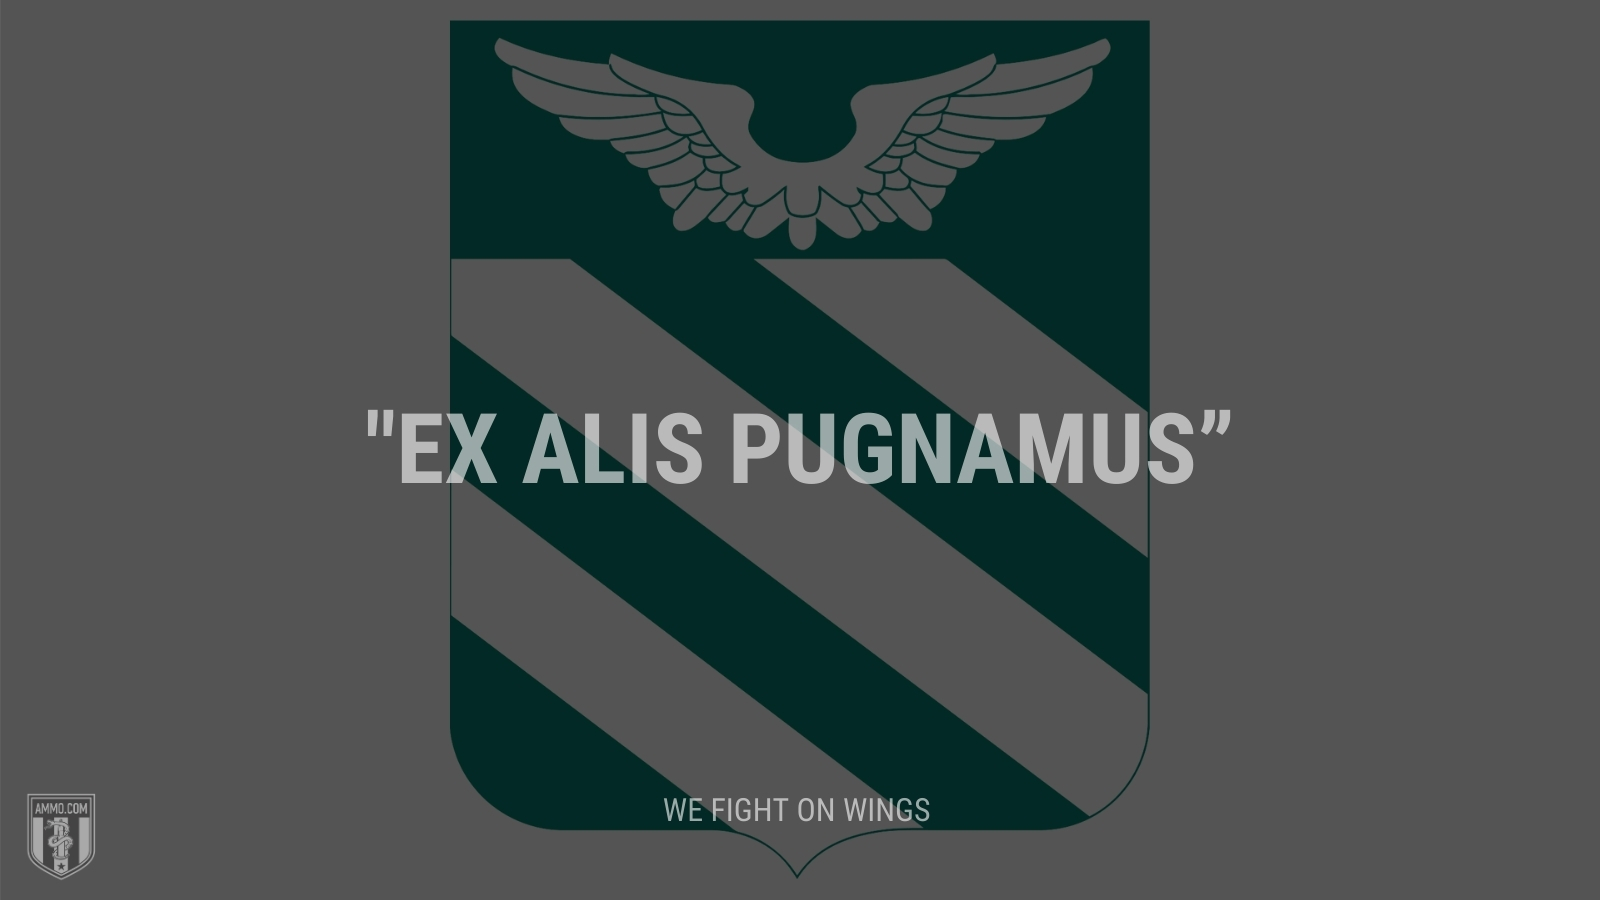 """Ex alis pugnamus"" - We fight on wings"